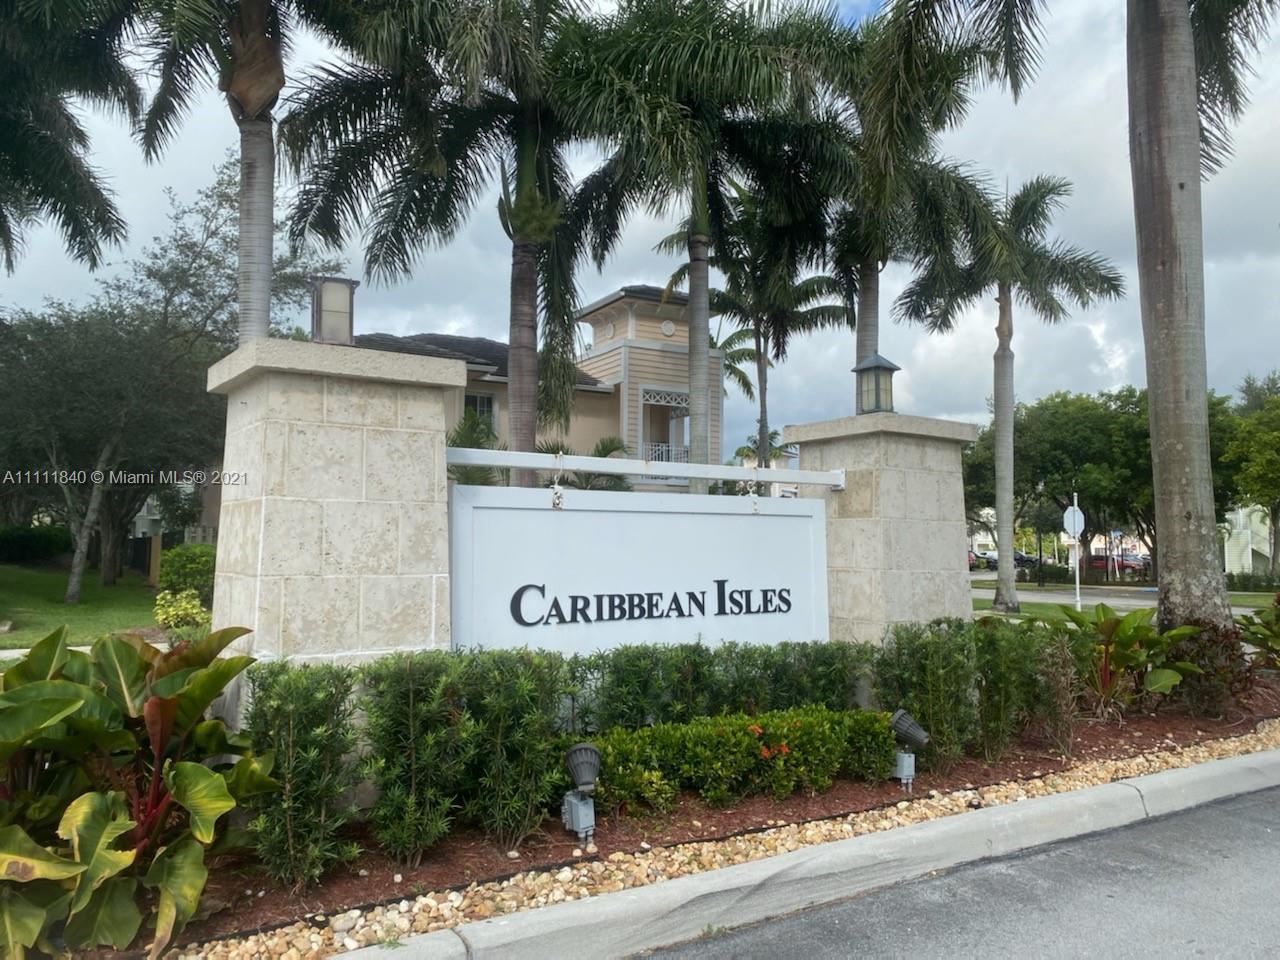 CARIBBEAN ISLES VILLAS CO Condo,For Sale,CARIBBEAN ISLES VILLAS CO Brickell,realty,broker,condos near me